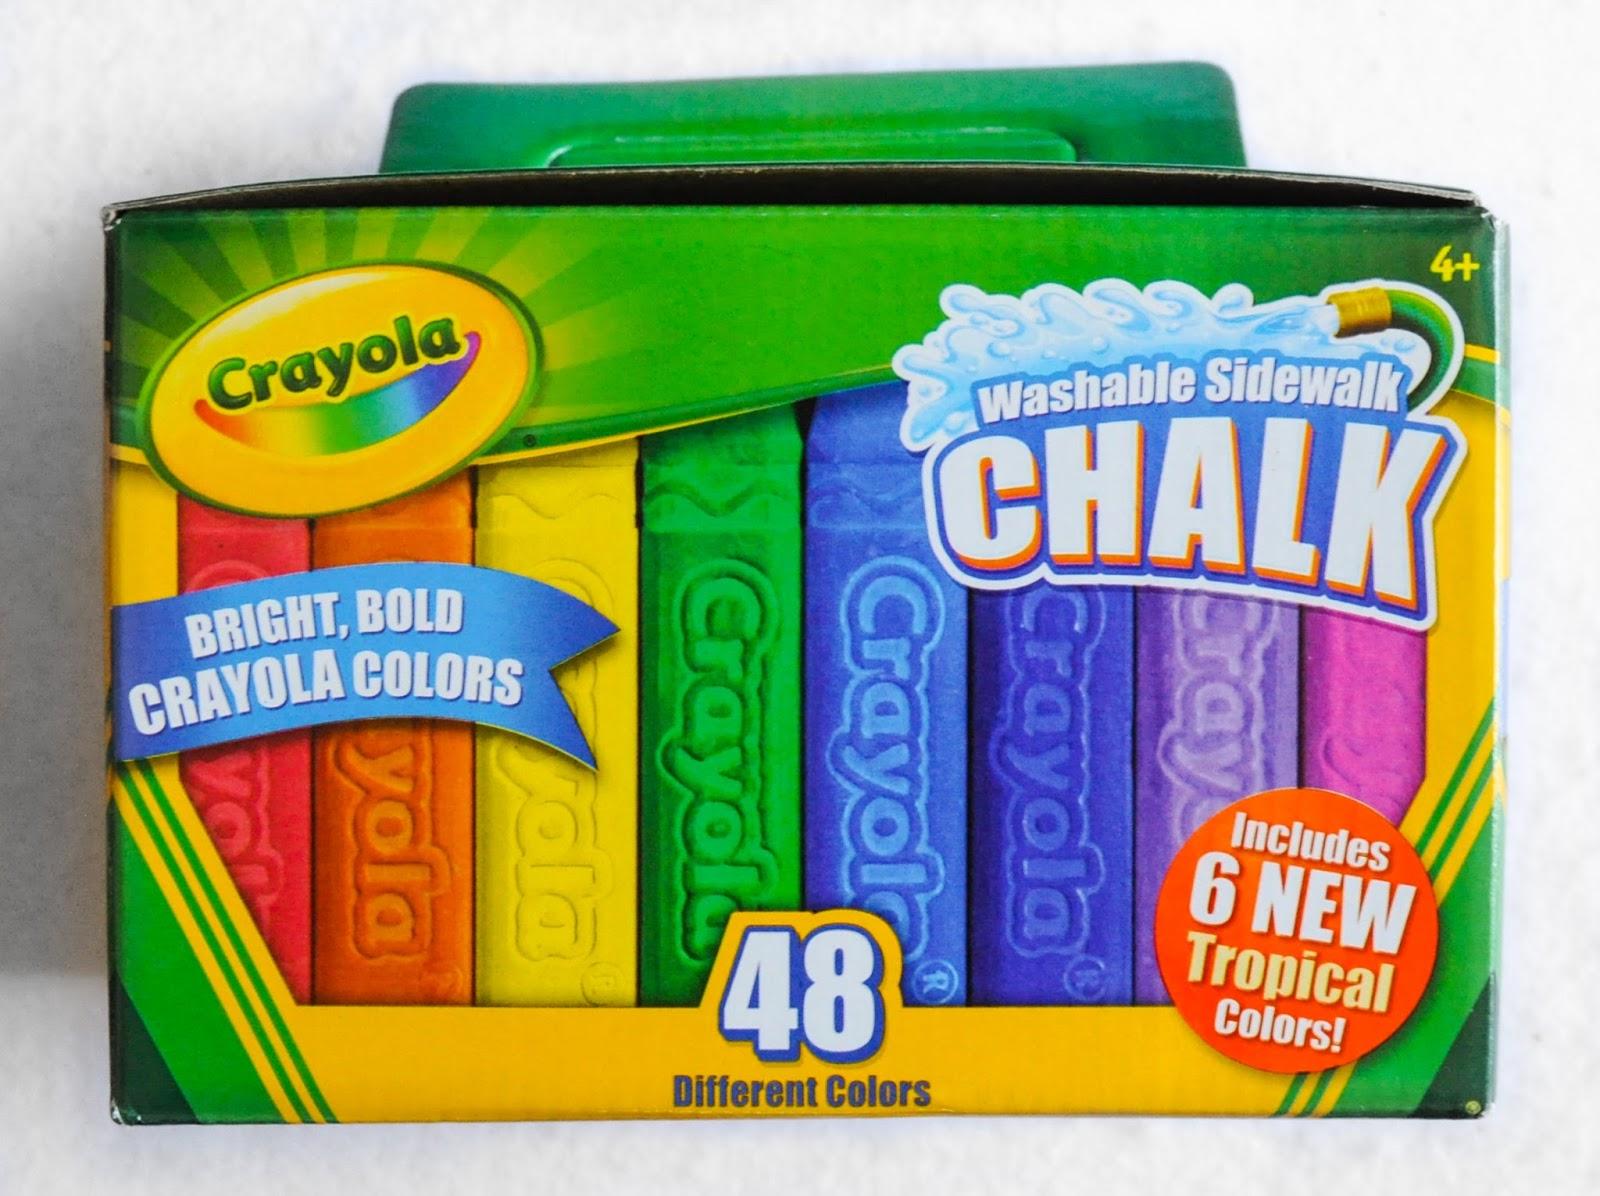 48 Count Crayola Washable Sidewalk Chalk: What\'s Inside the Box ...